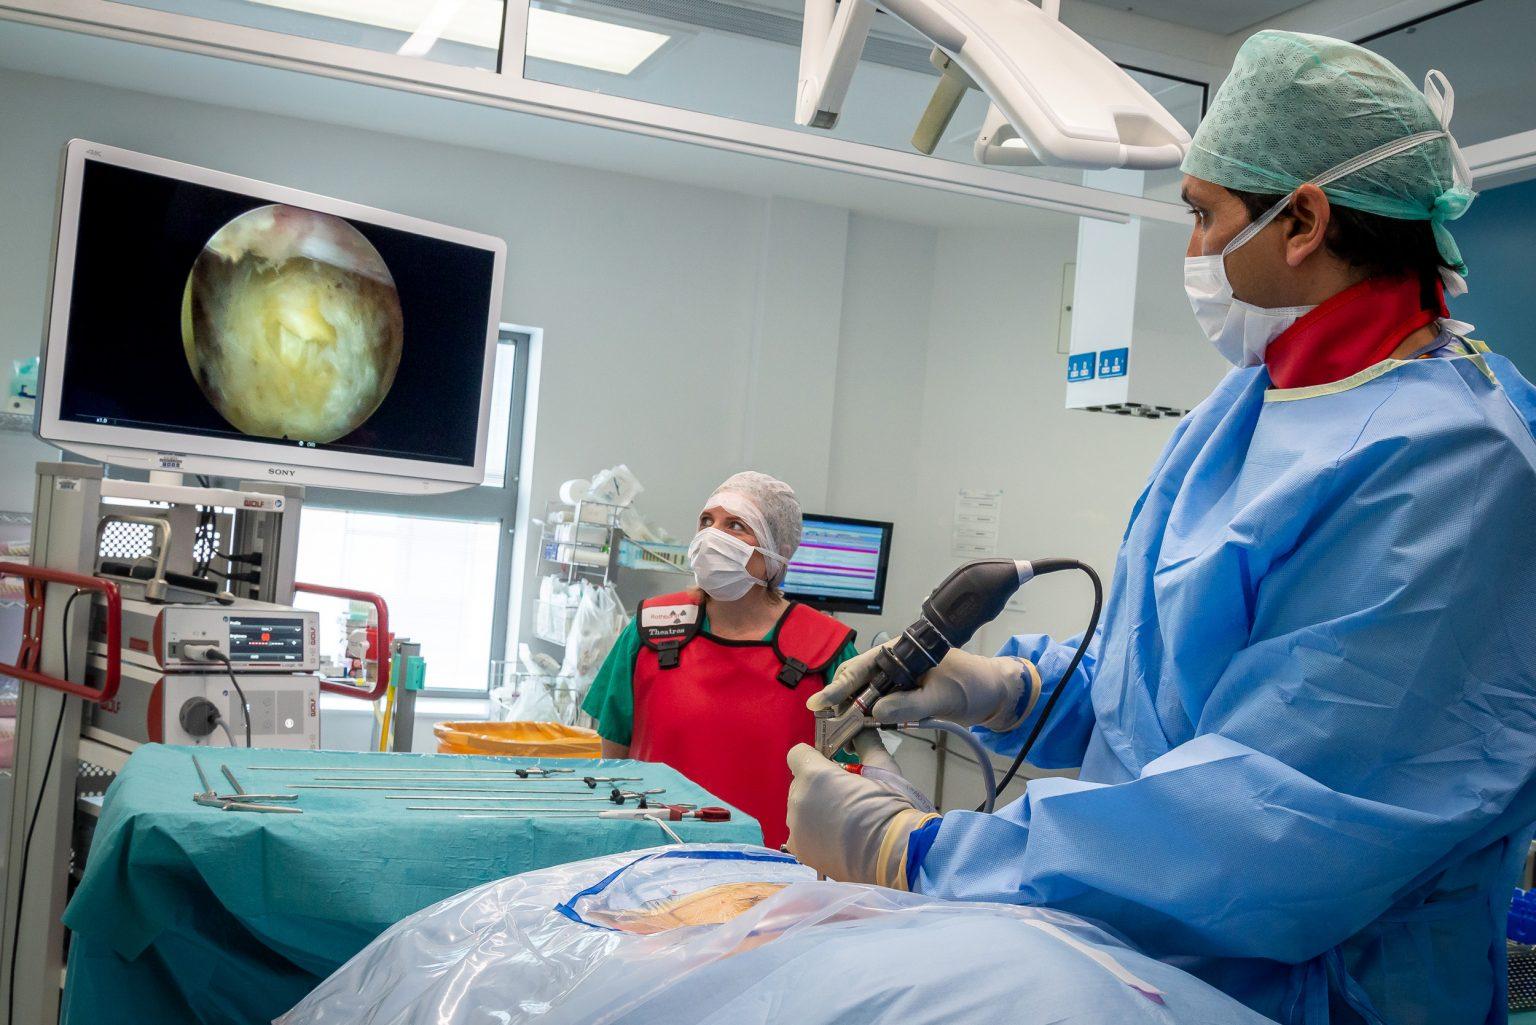 LoF Endoscope donation